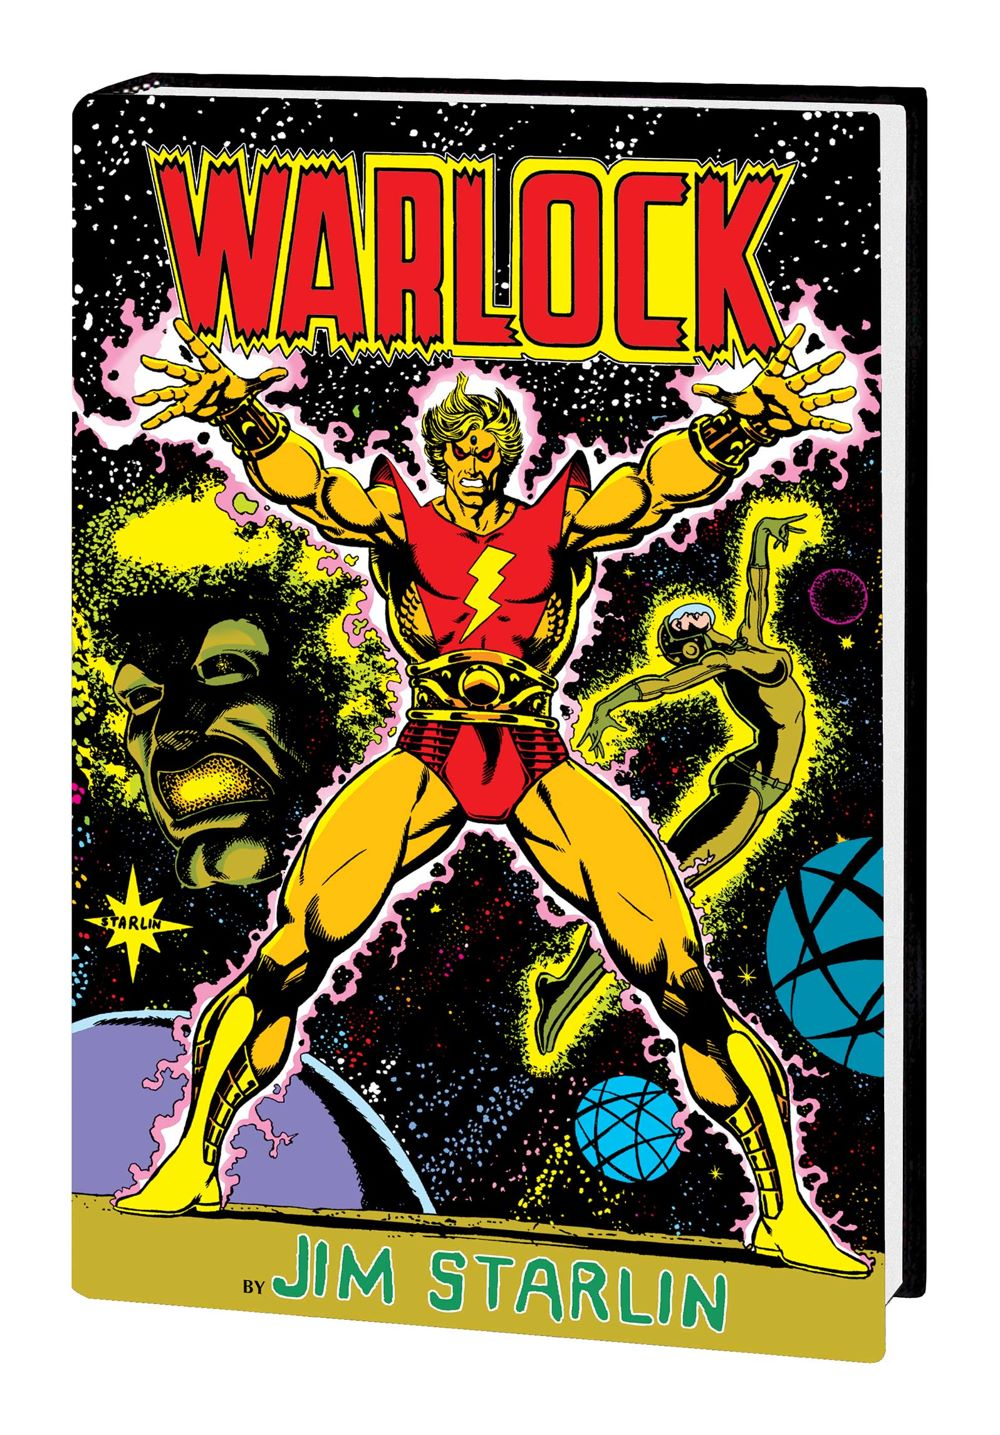 WARLCKJSGE_HC Marvel Comics August 2021 Solicitations